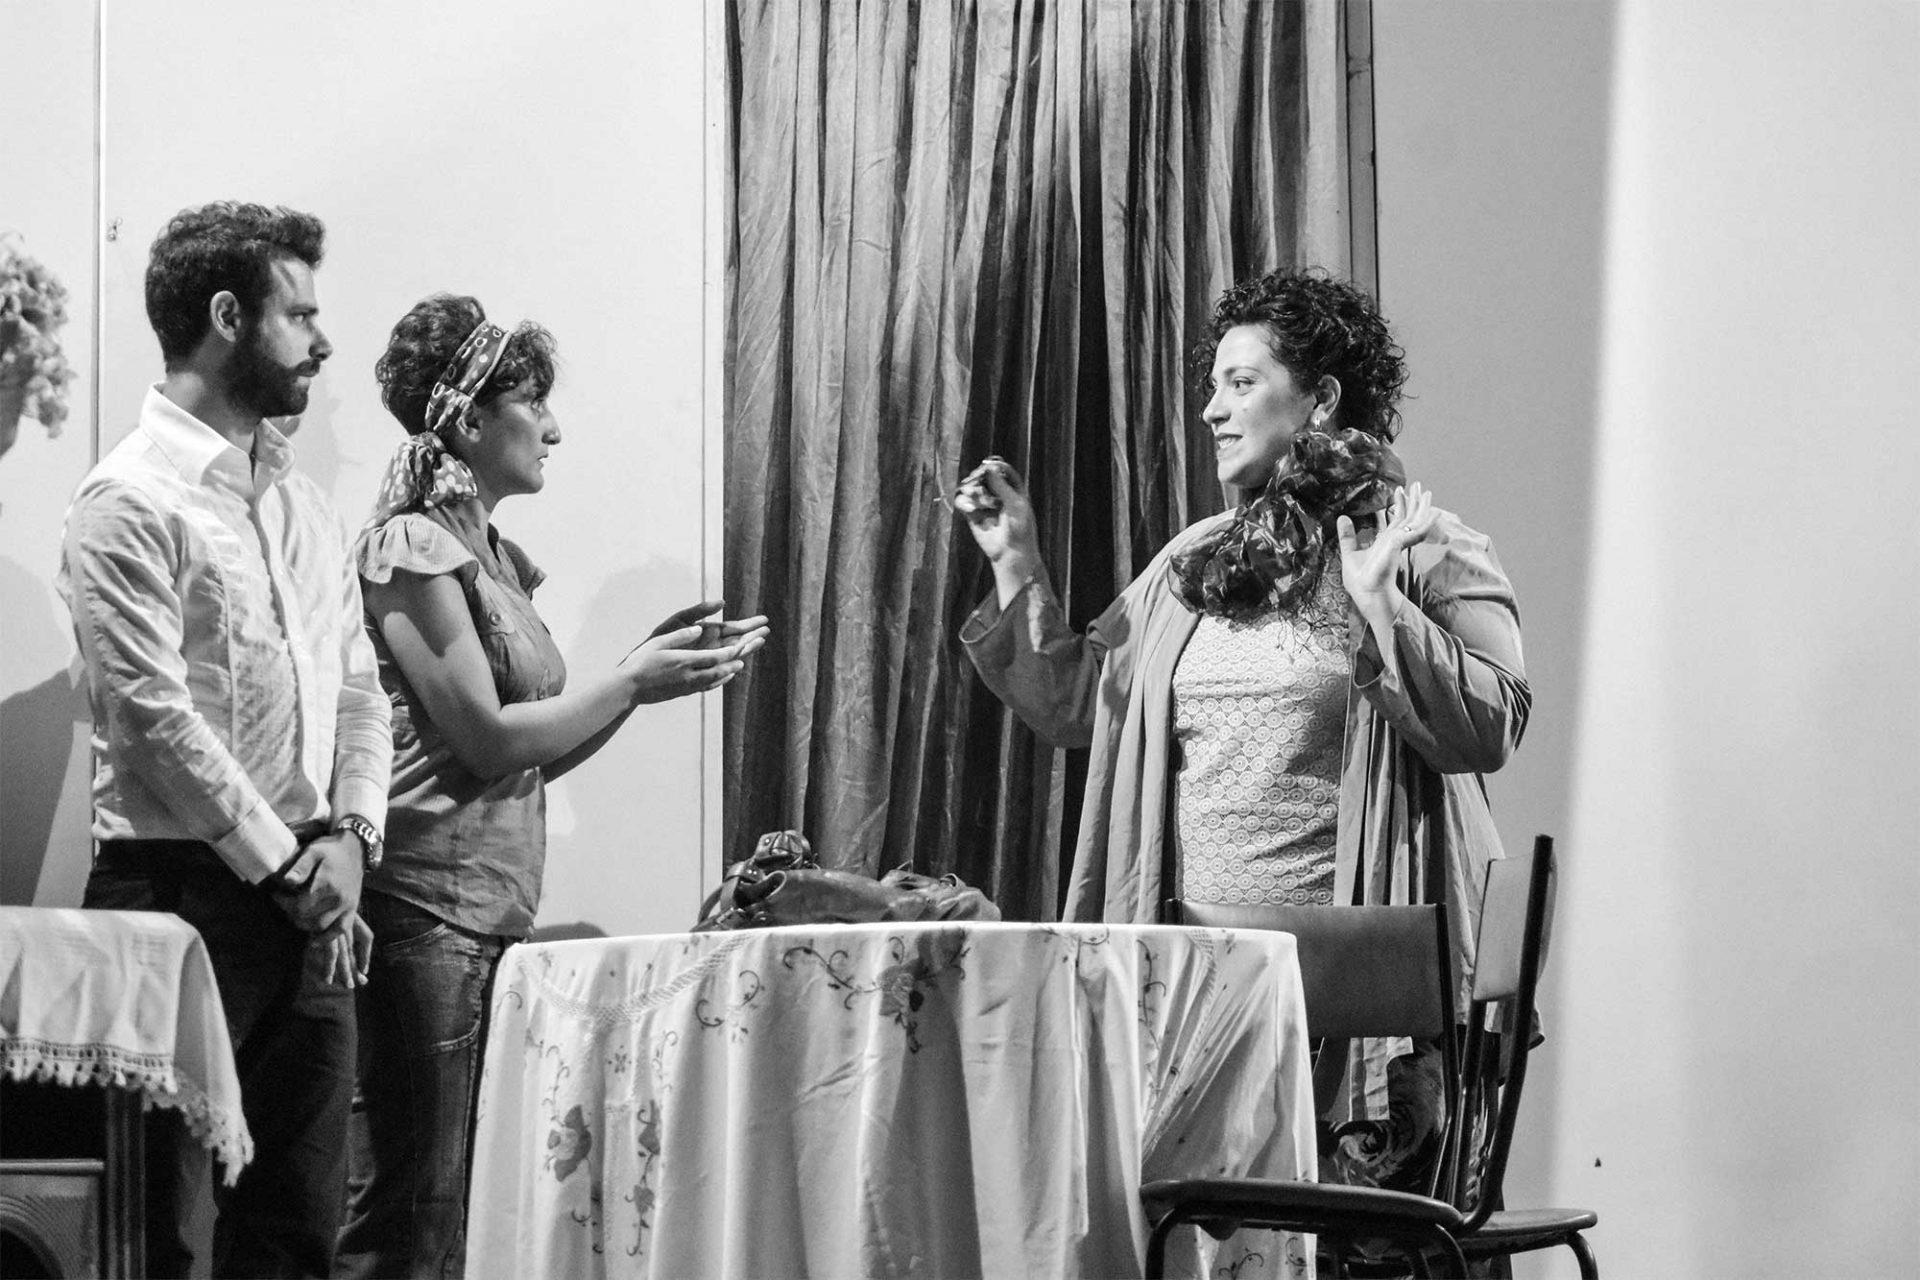 teatro-dialettale-lu-lette-gna-te-le-fie-marrucino